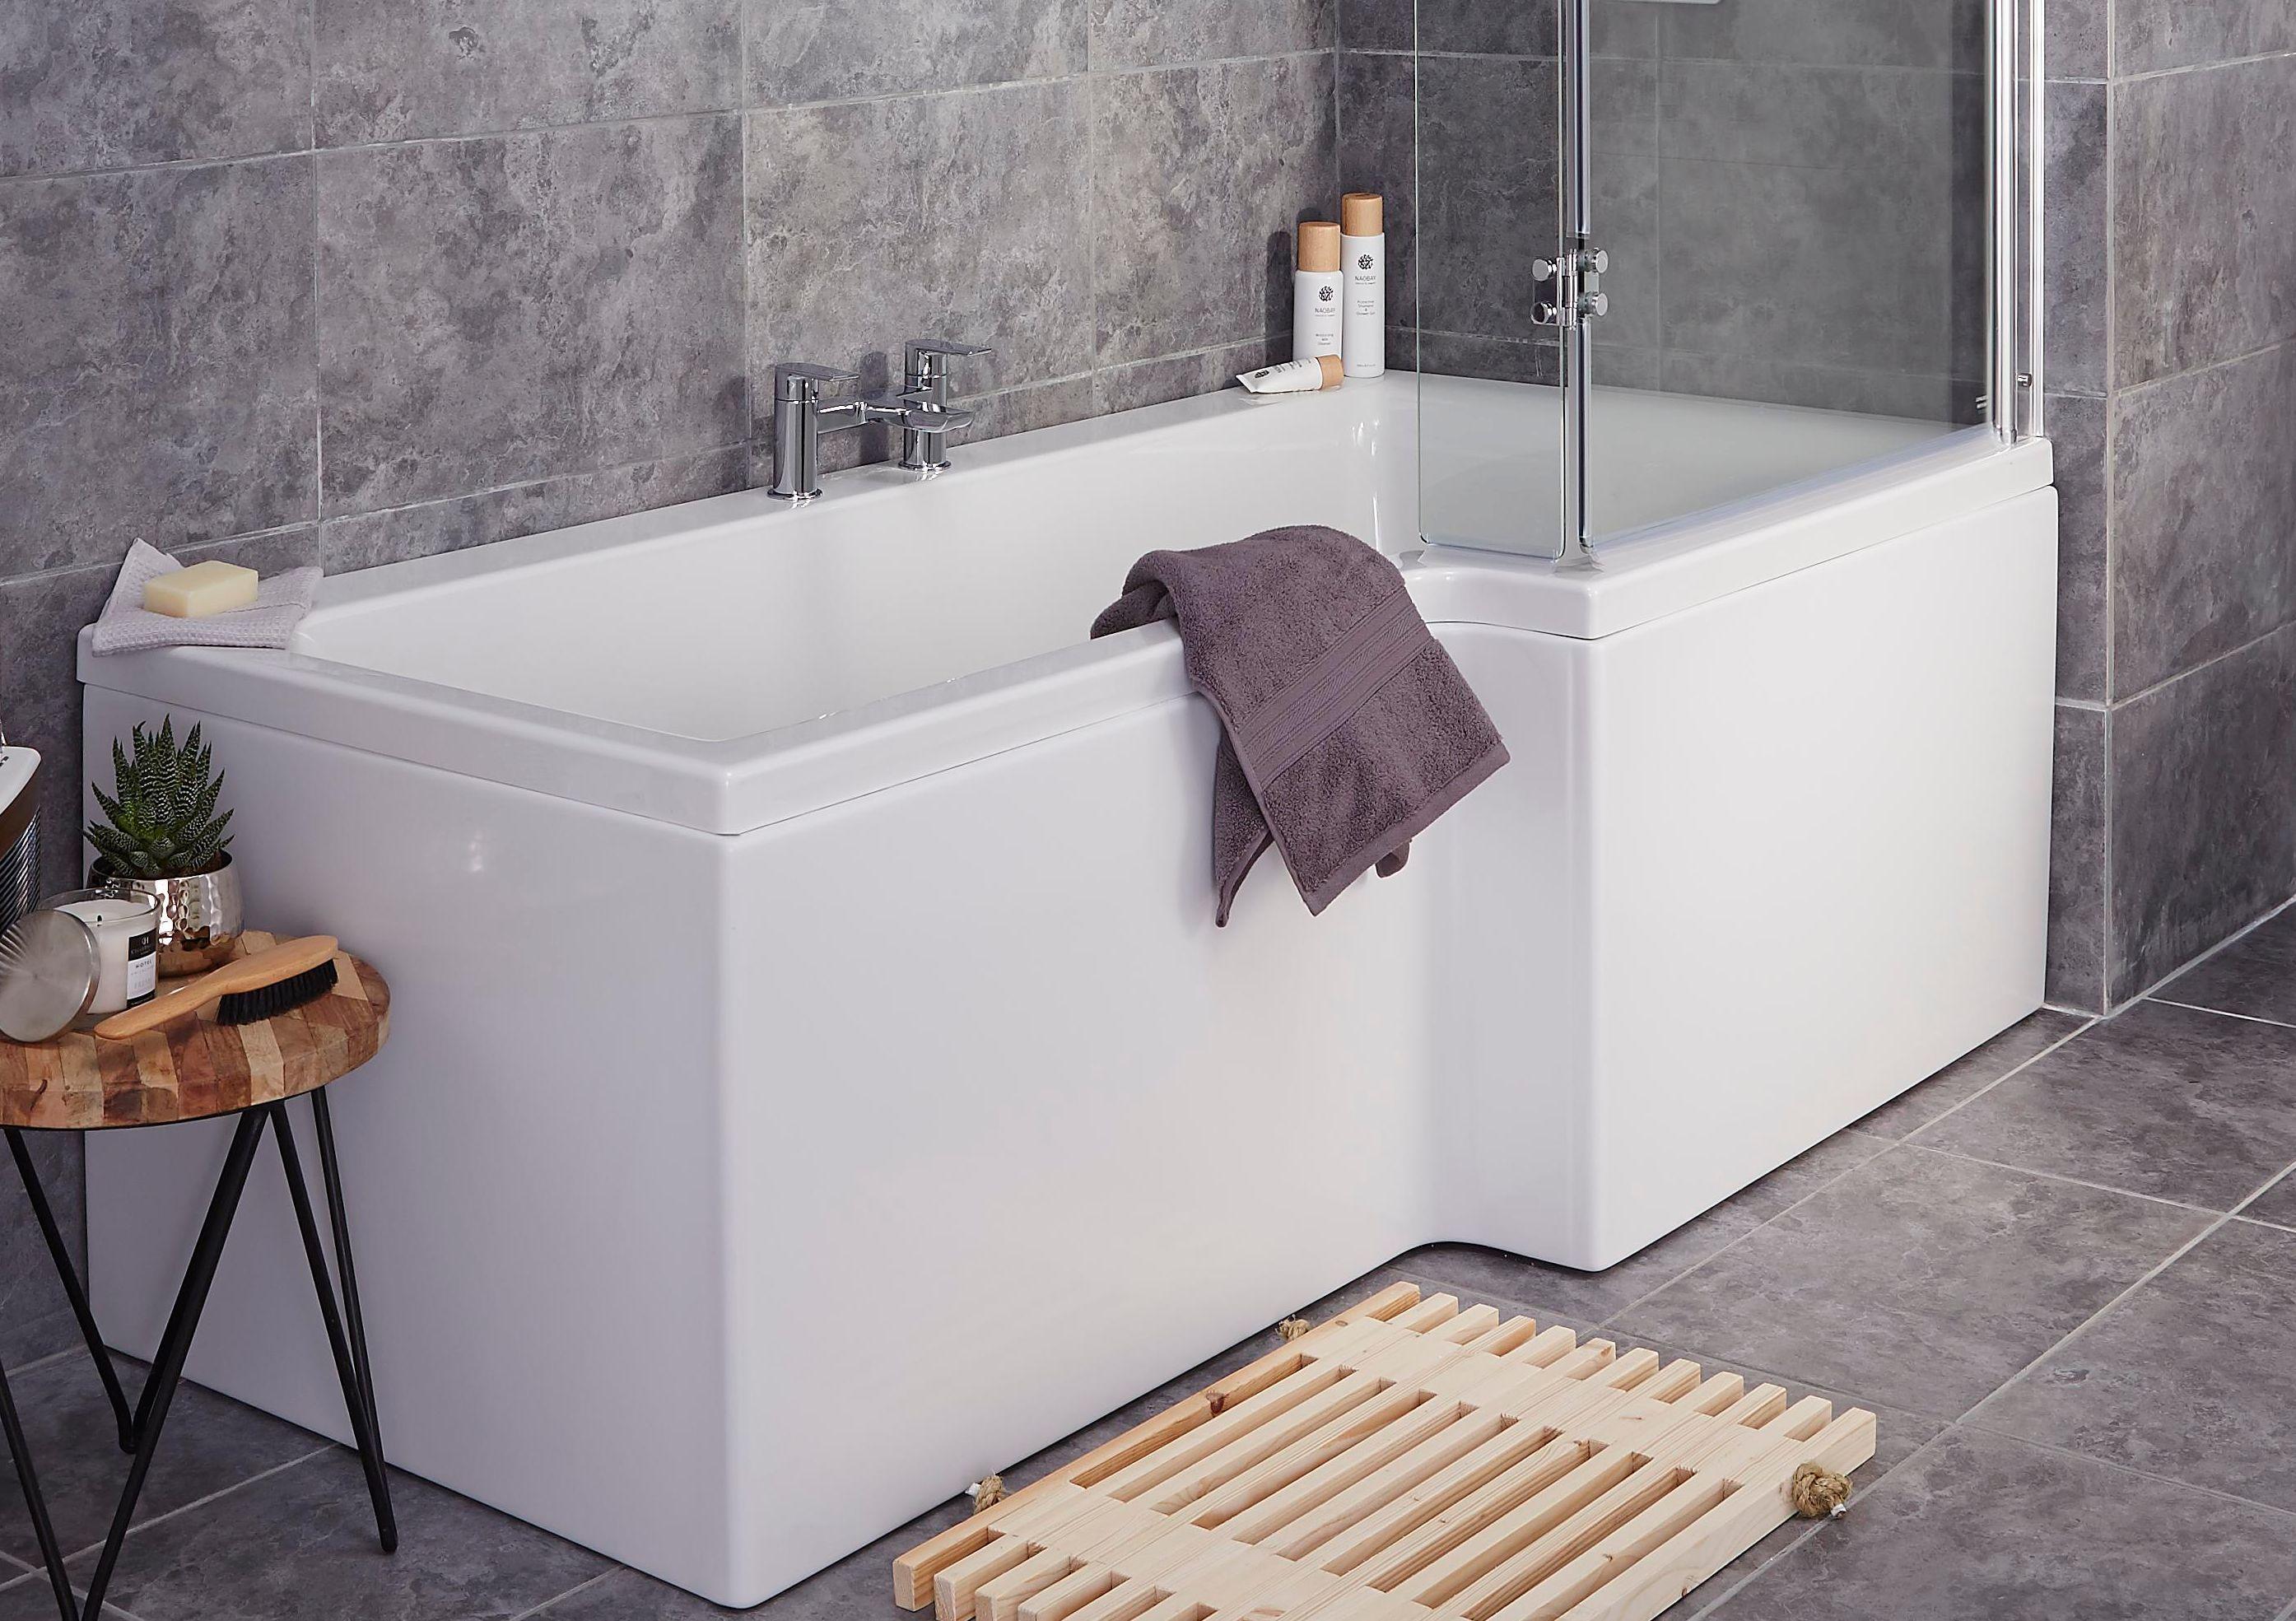 baths shower amp corner diy and whirlpool bathroom city | Home ...